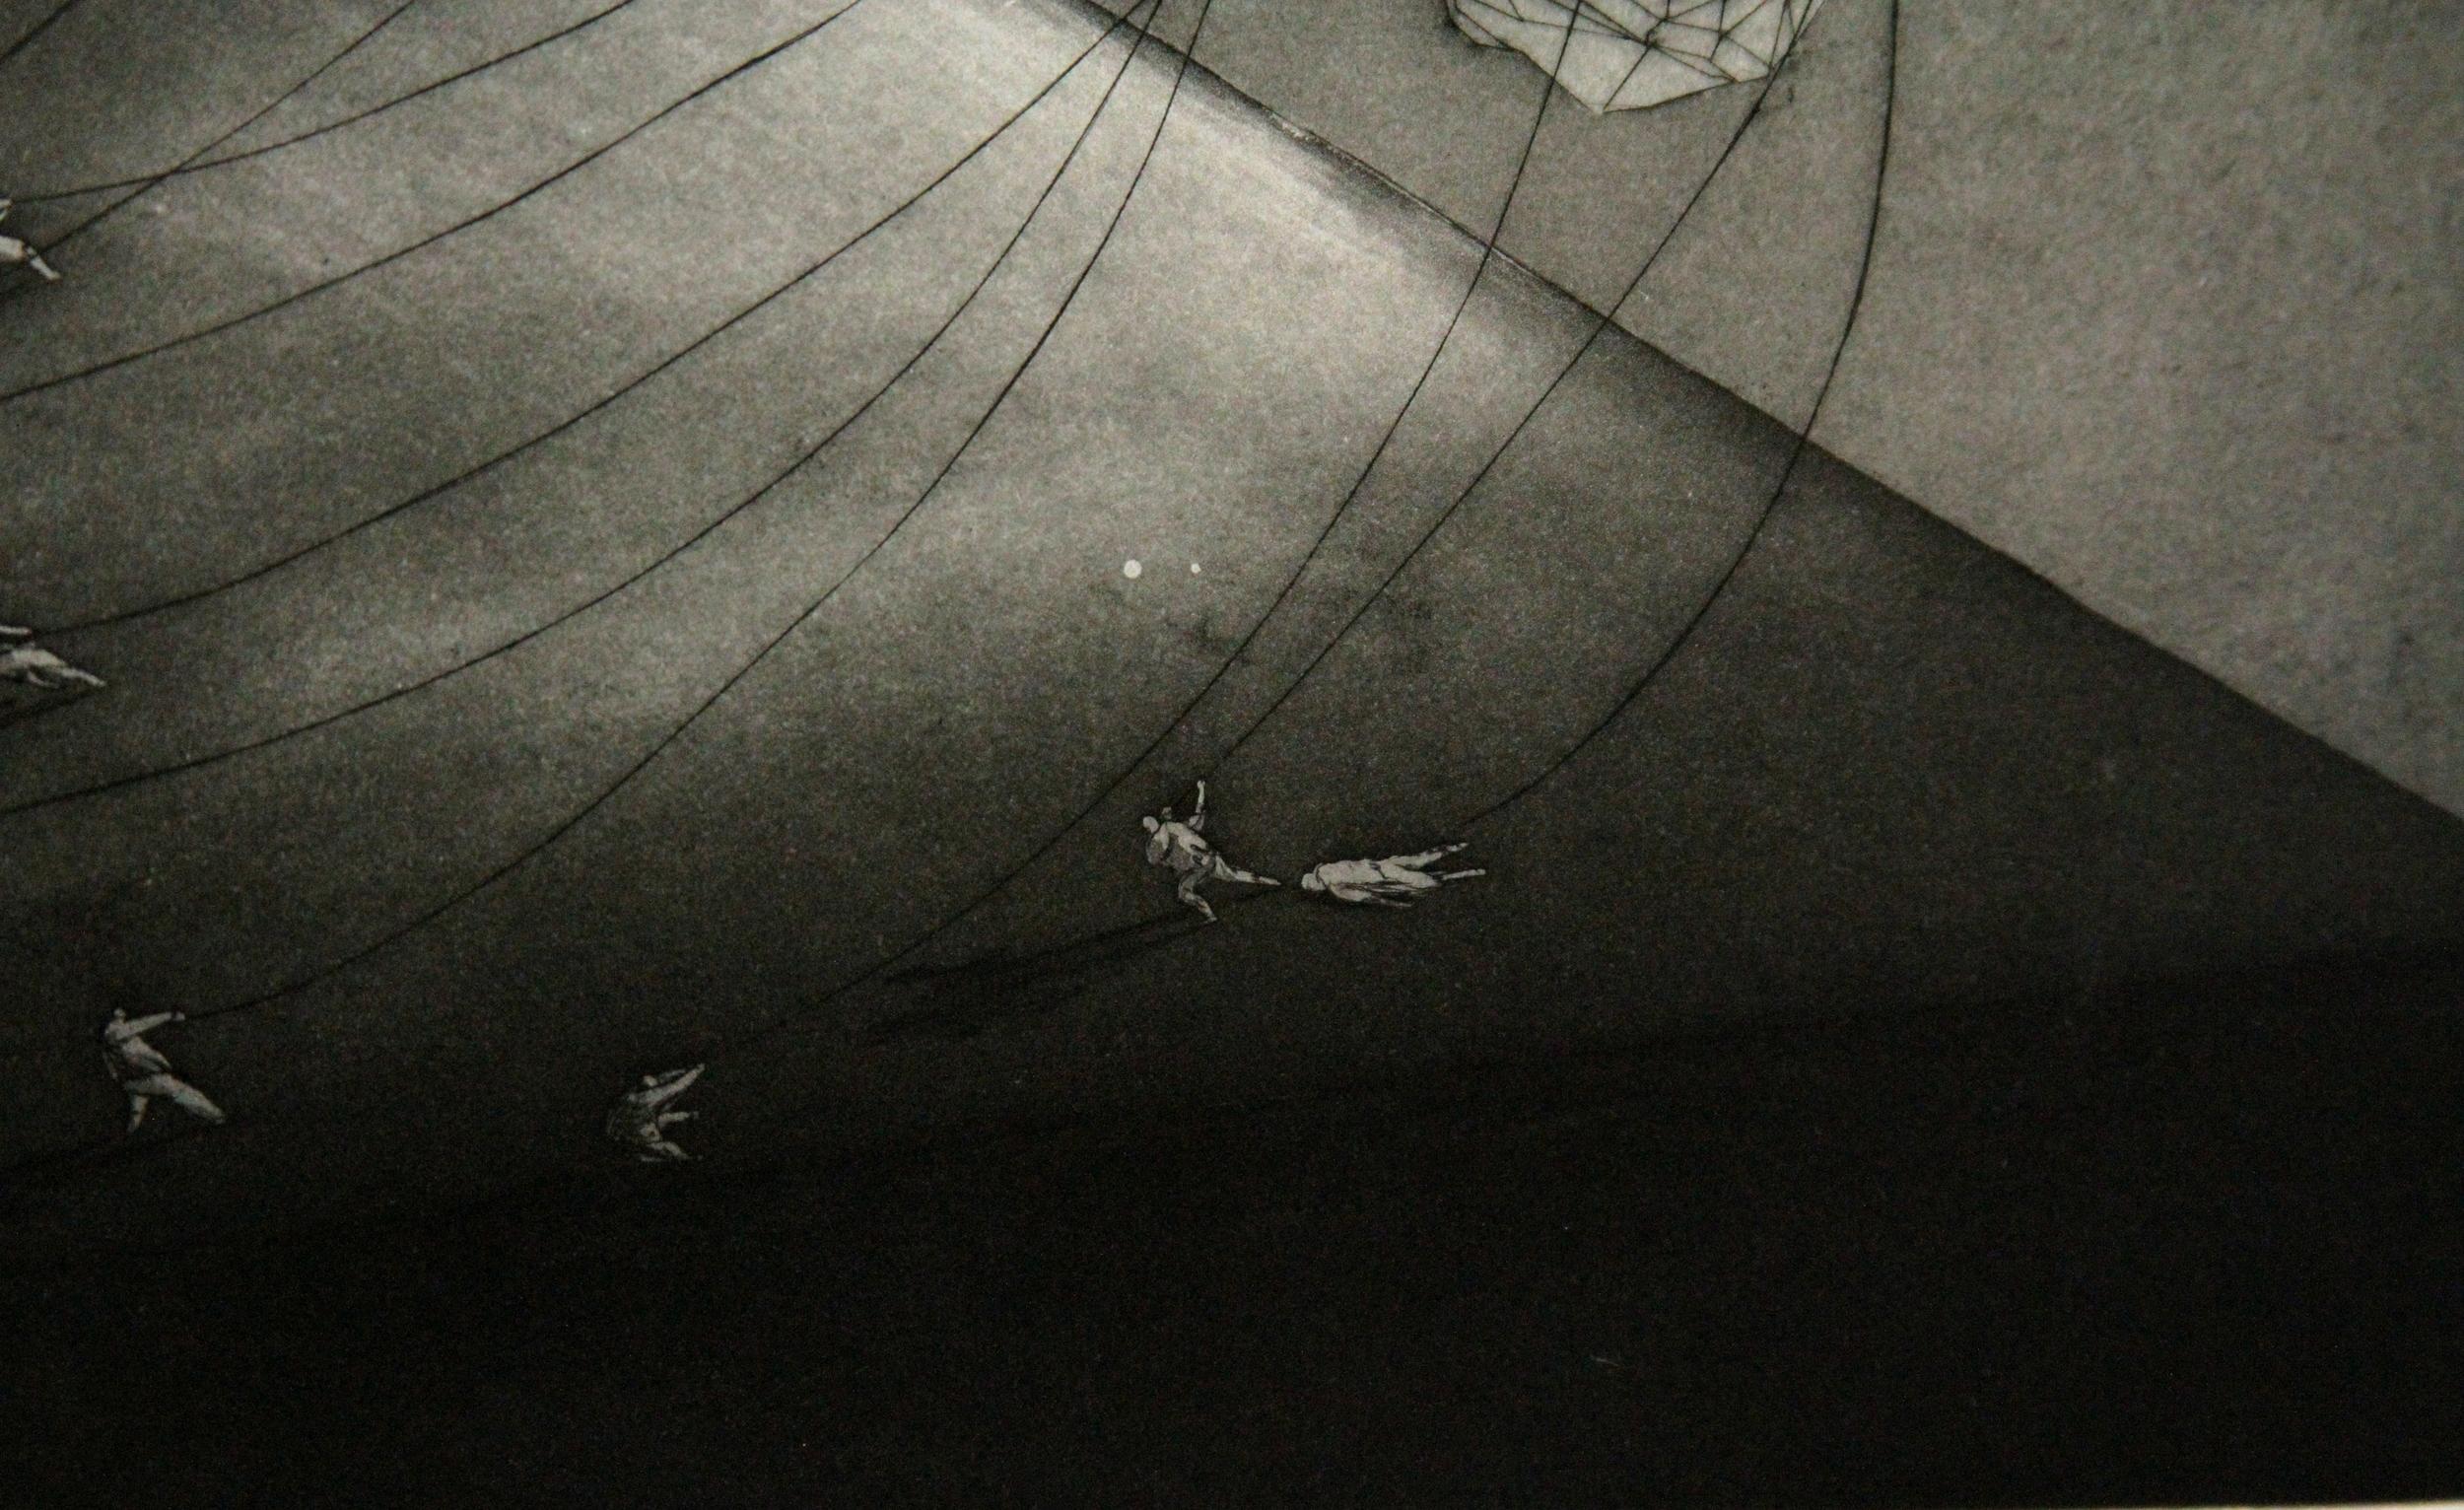 The innumerable struggle beneath this distant burden. (Detail)